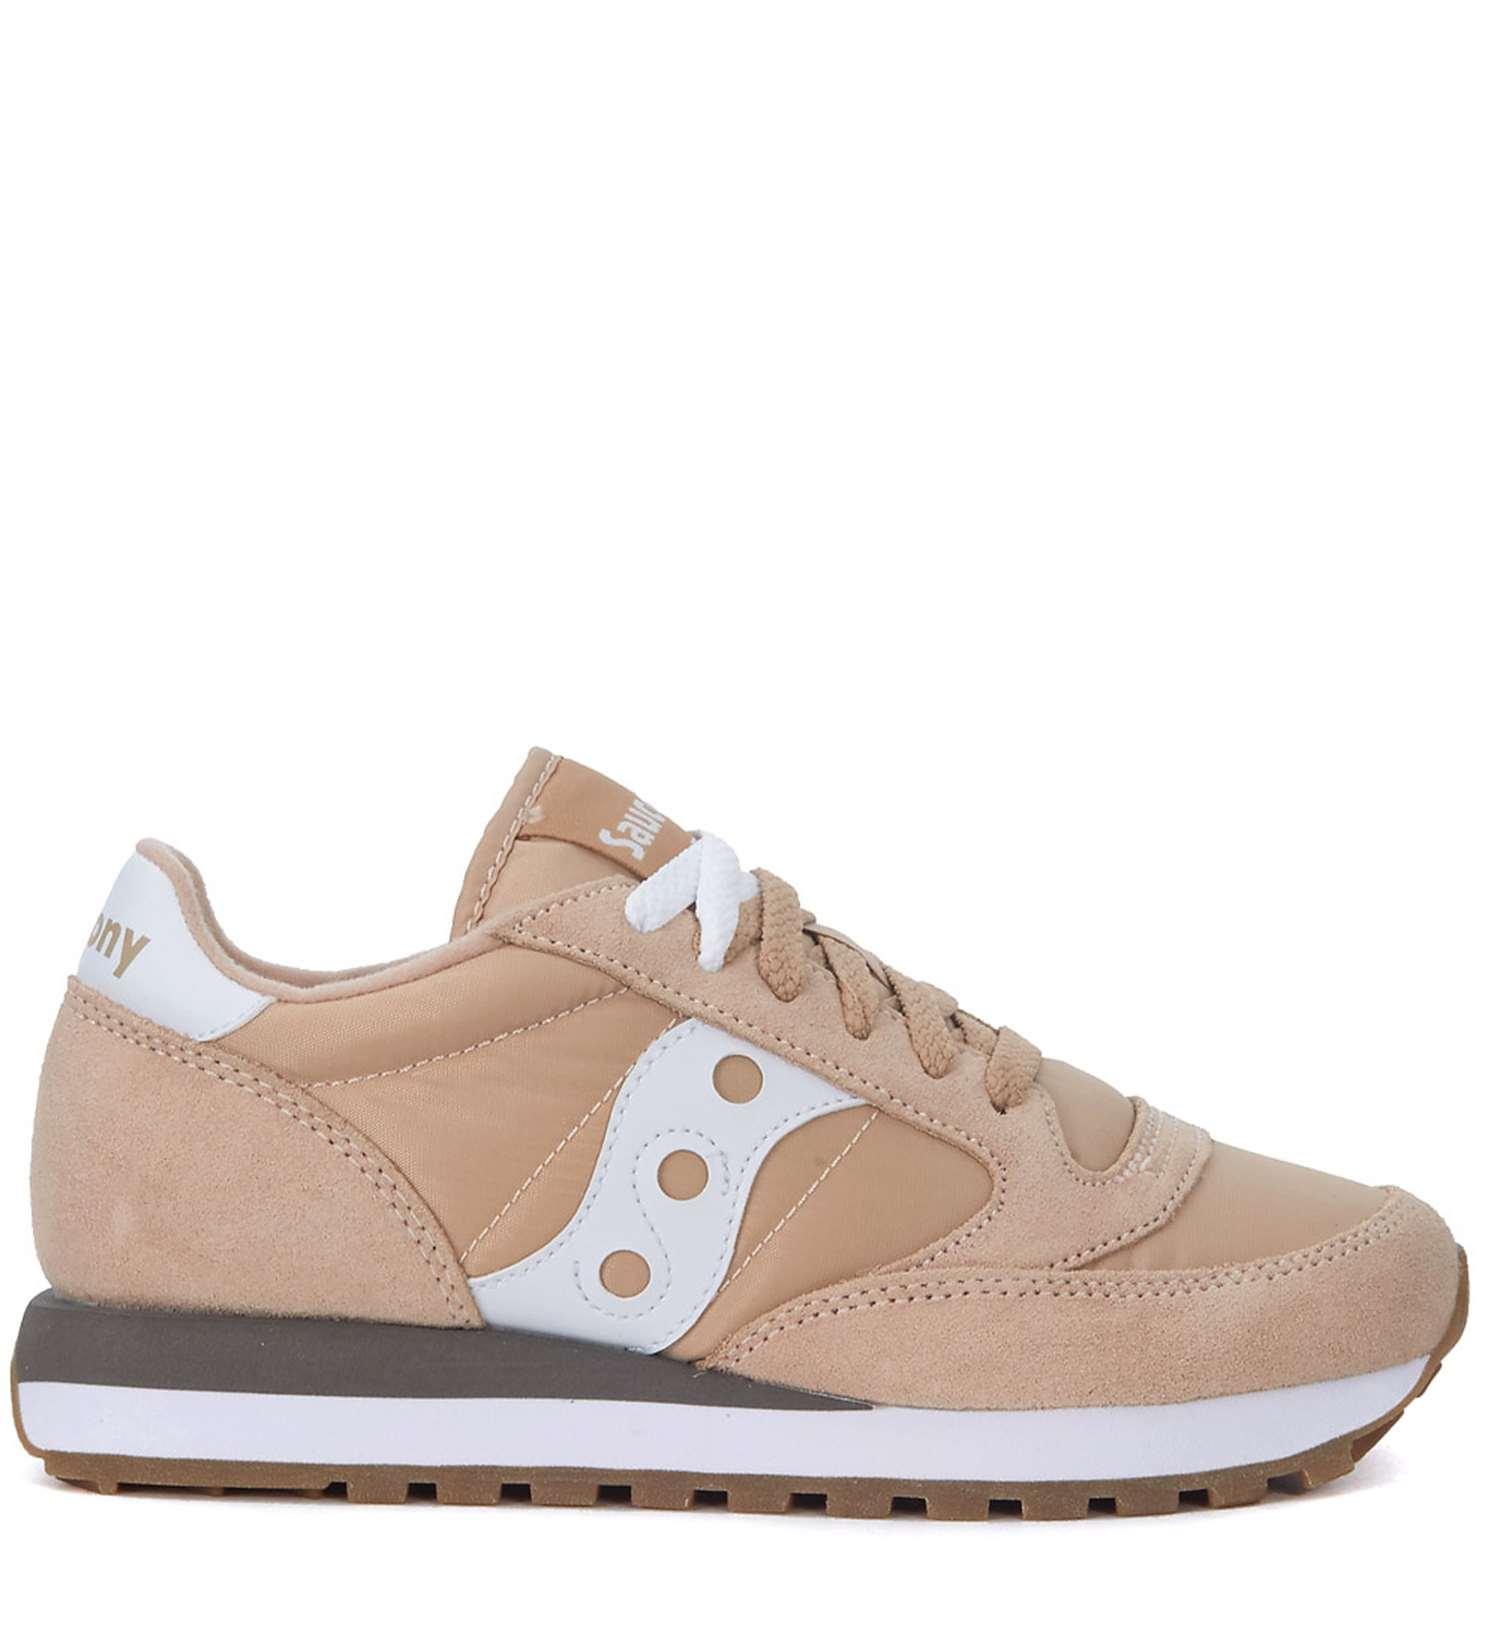 big sale b5cce a4198 Alta qualit Sneakers Donna Saucony S1044440 Primavera Estate vendita. ADIDAS  Originals Da Donna Tubolari virale W Scarpe da ginnastica ...